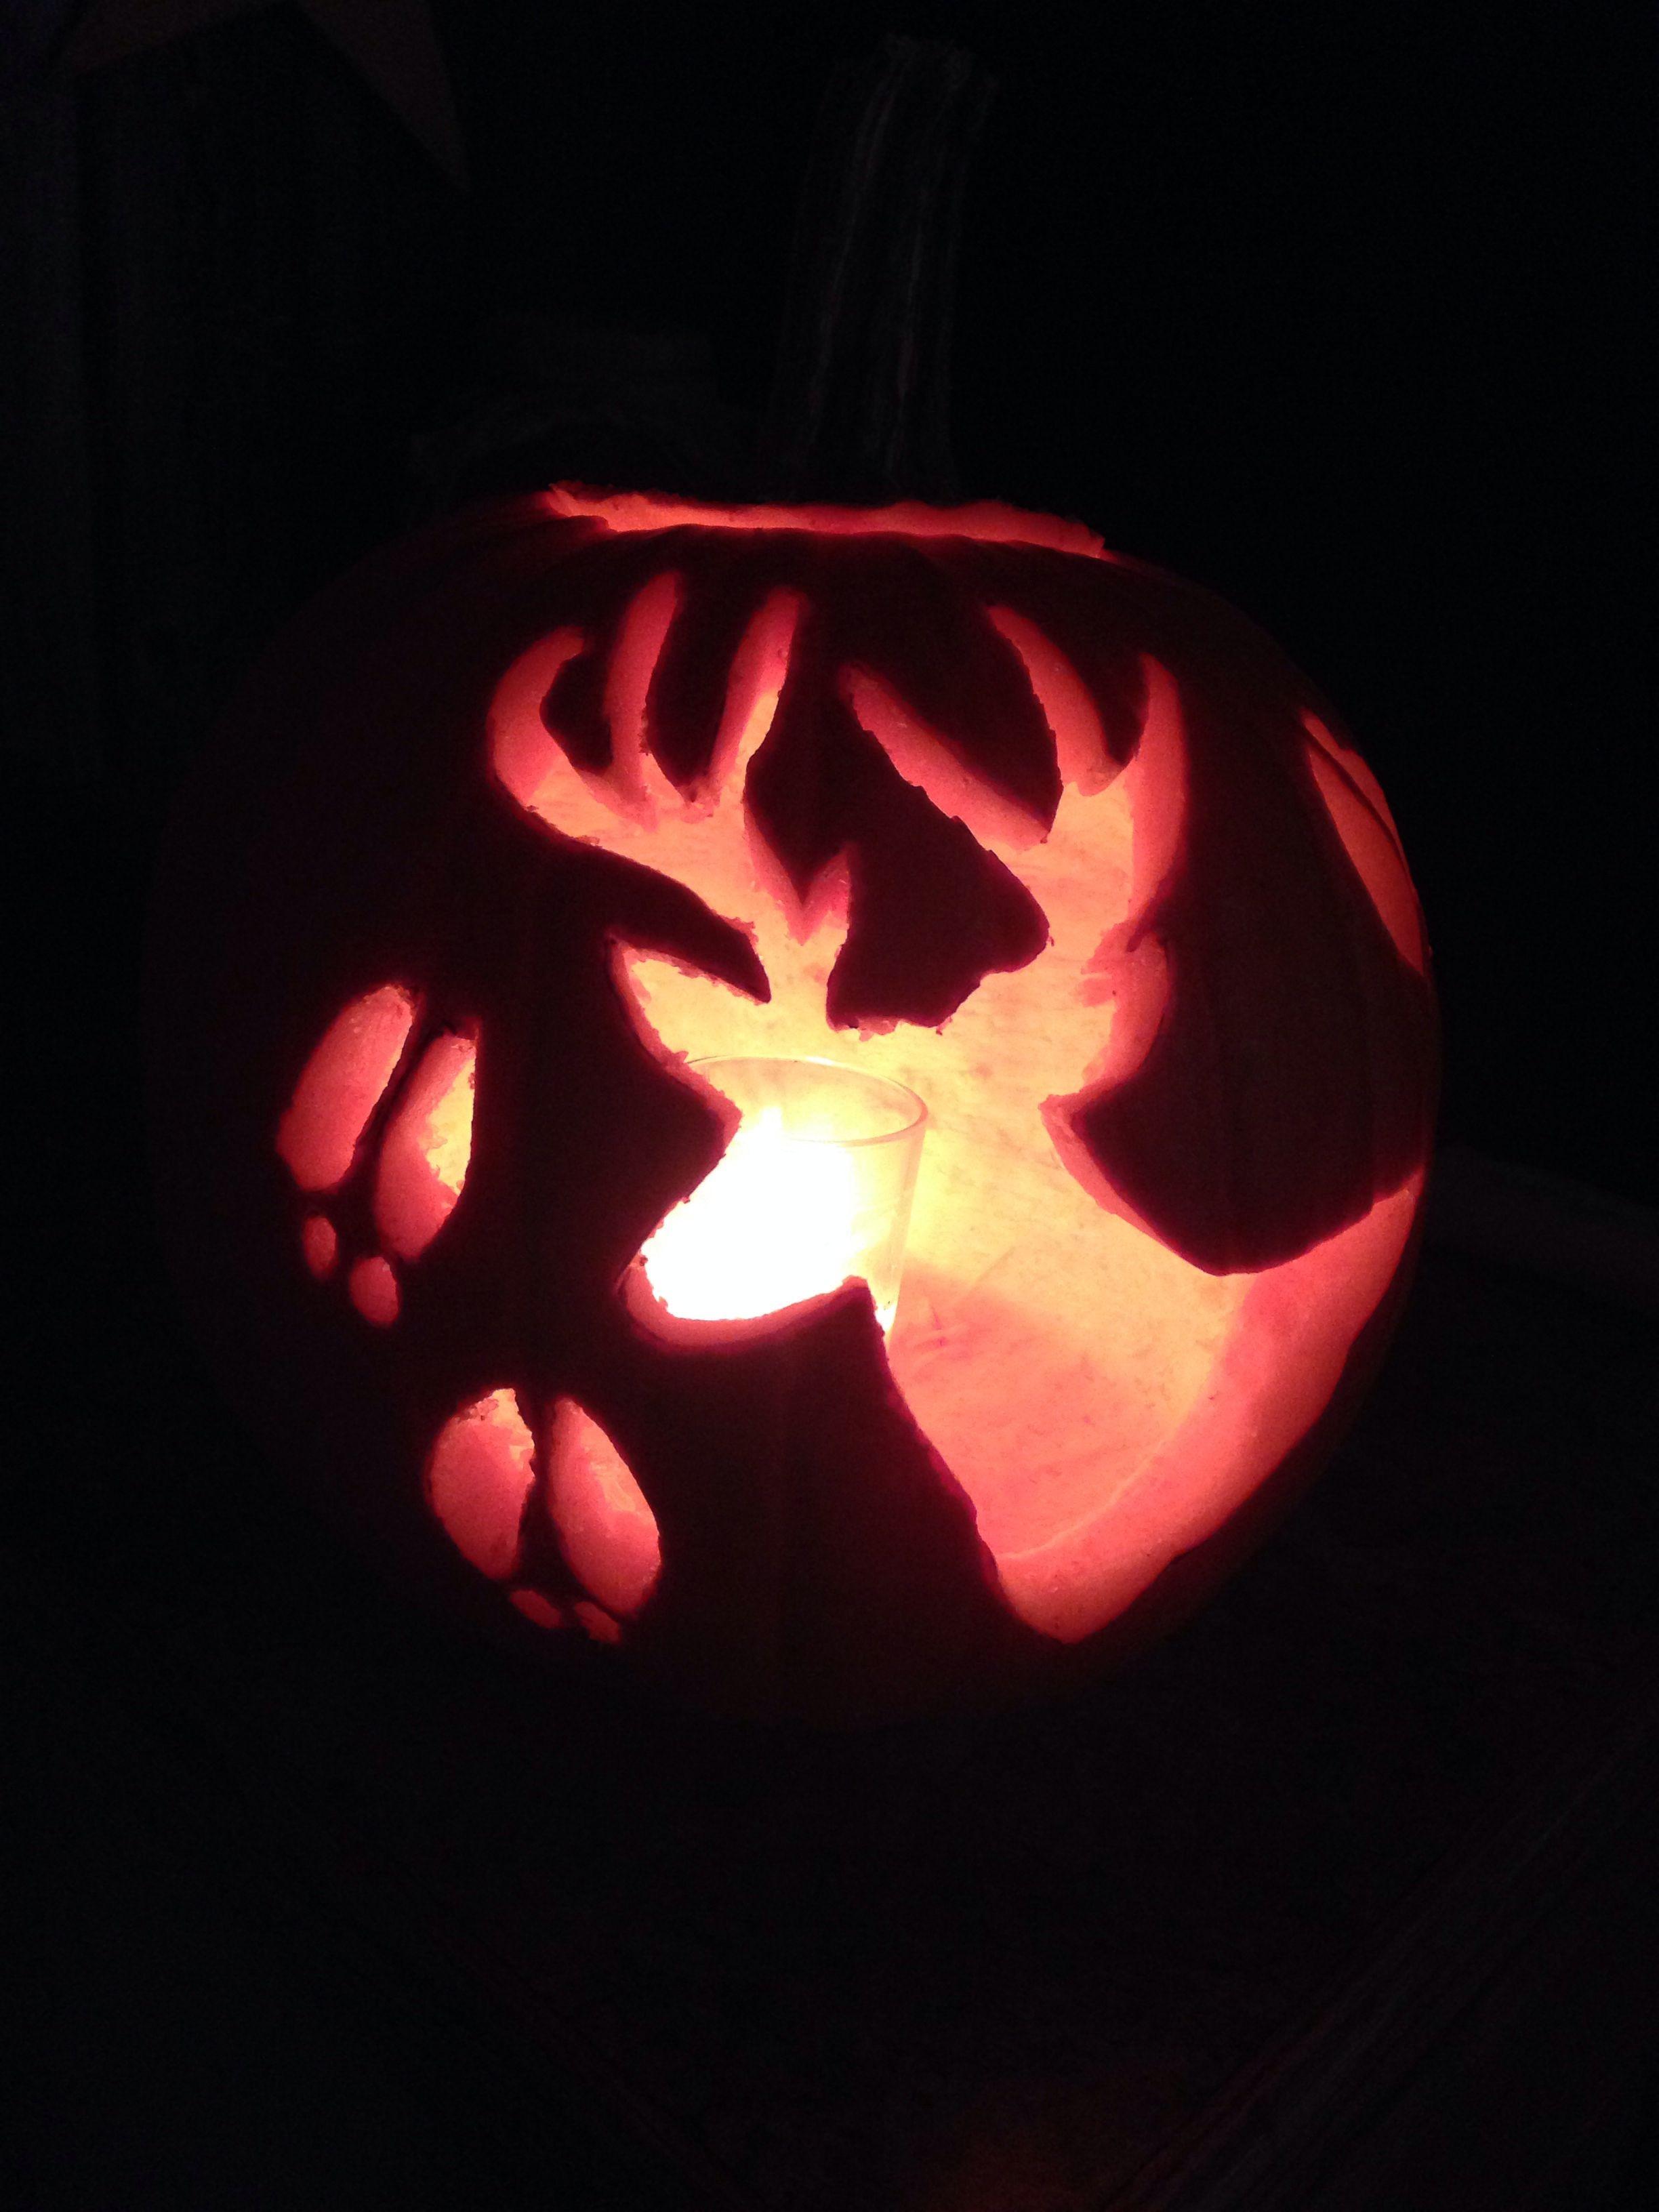 Diy Deer Silhouette Pumpkin Carving | Other Holiday Ideas | Pumpkin - Free Printable Deer Pumpkin Stencils